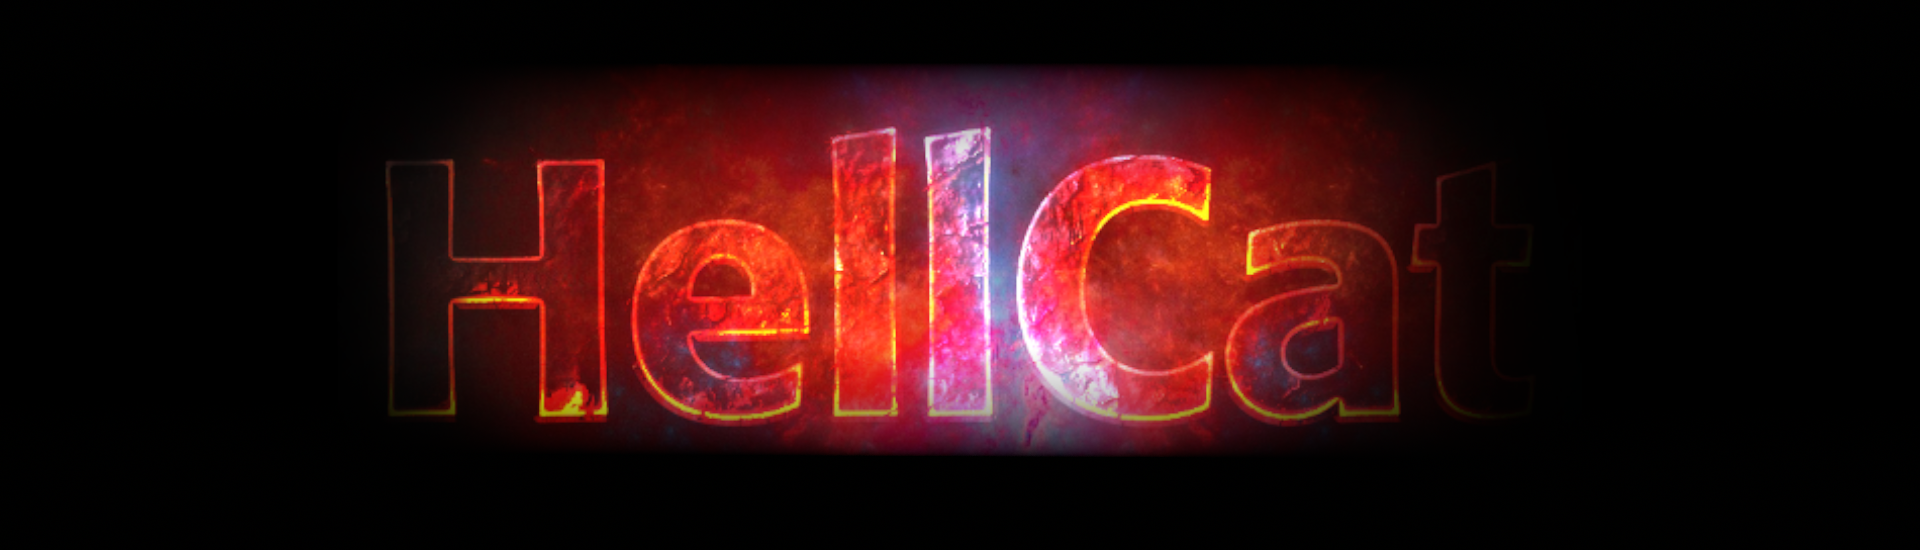 HellCat cover